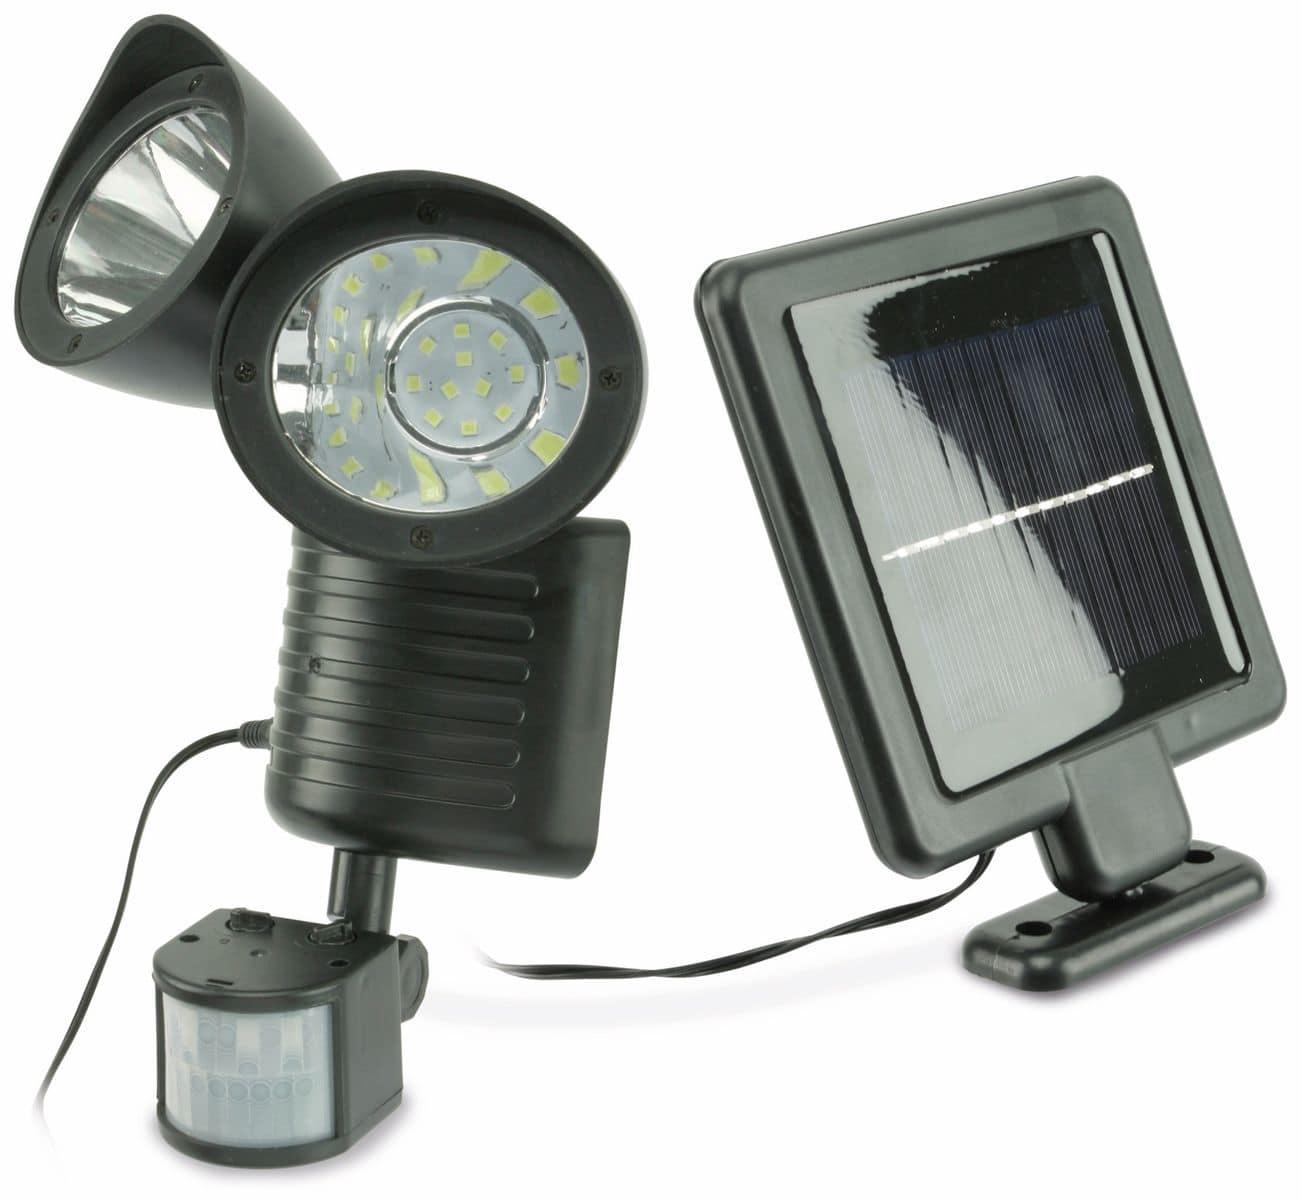 solar led strahler mit bewegungsmelder 1 w schwarz. Black Bedroom Furniture Sets. Home Design Ideas